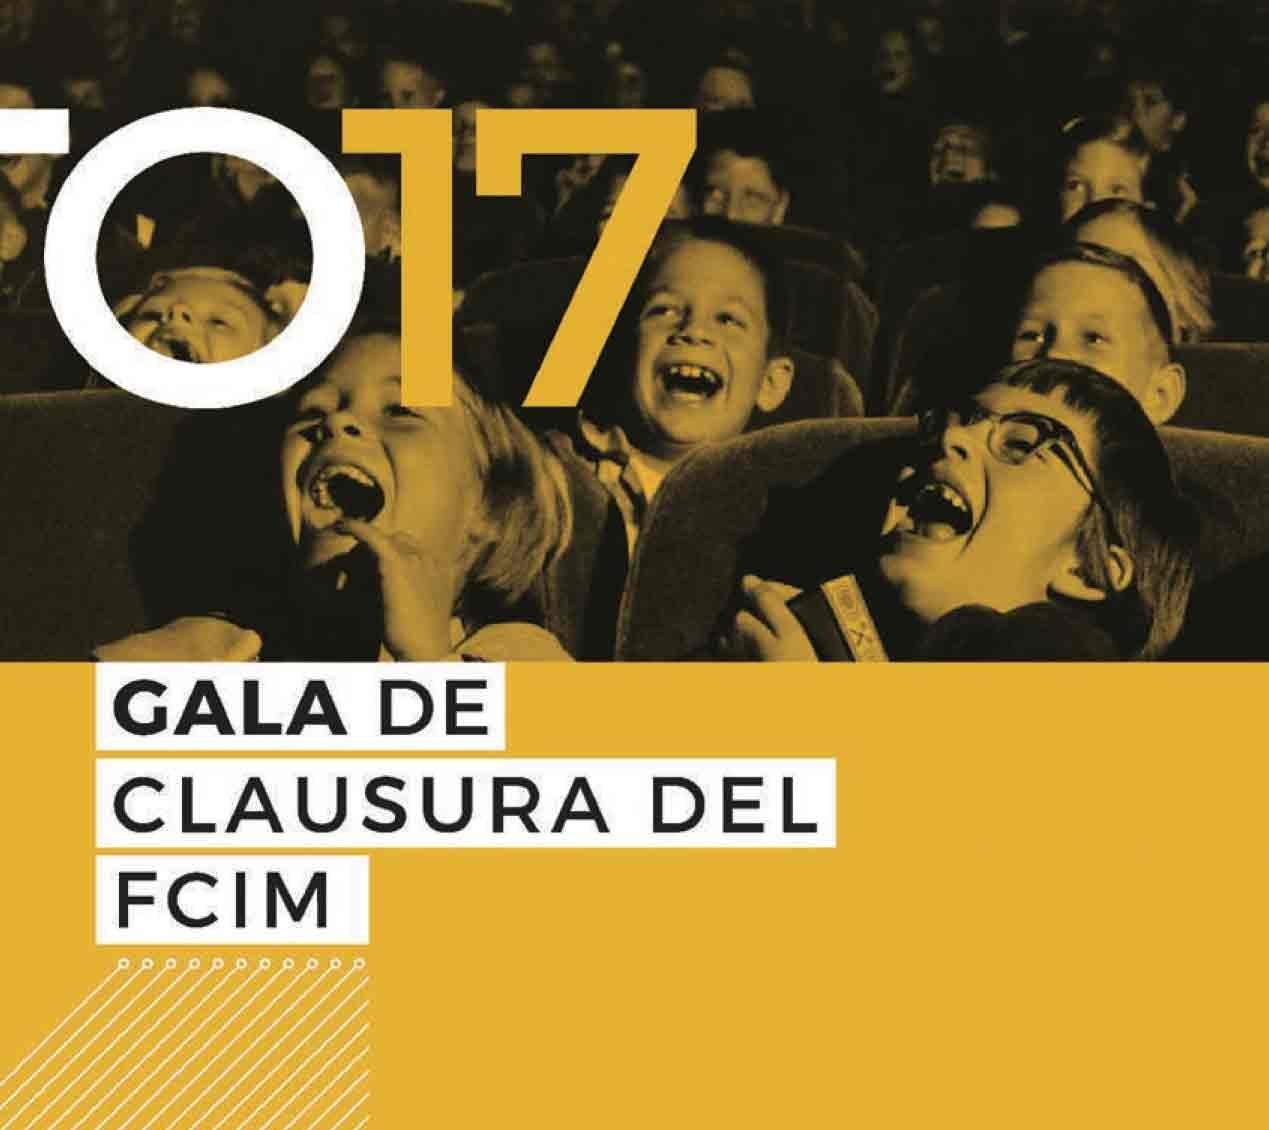 GALA DE CLAUSURA // FCIM 2017